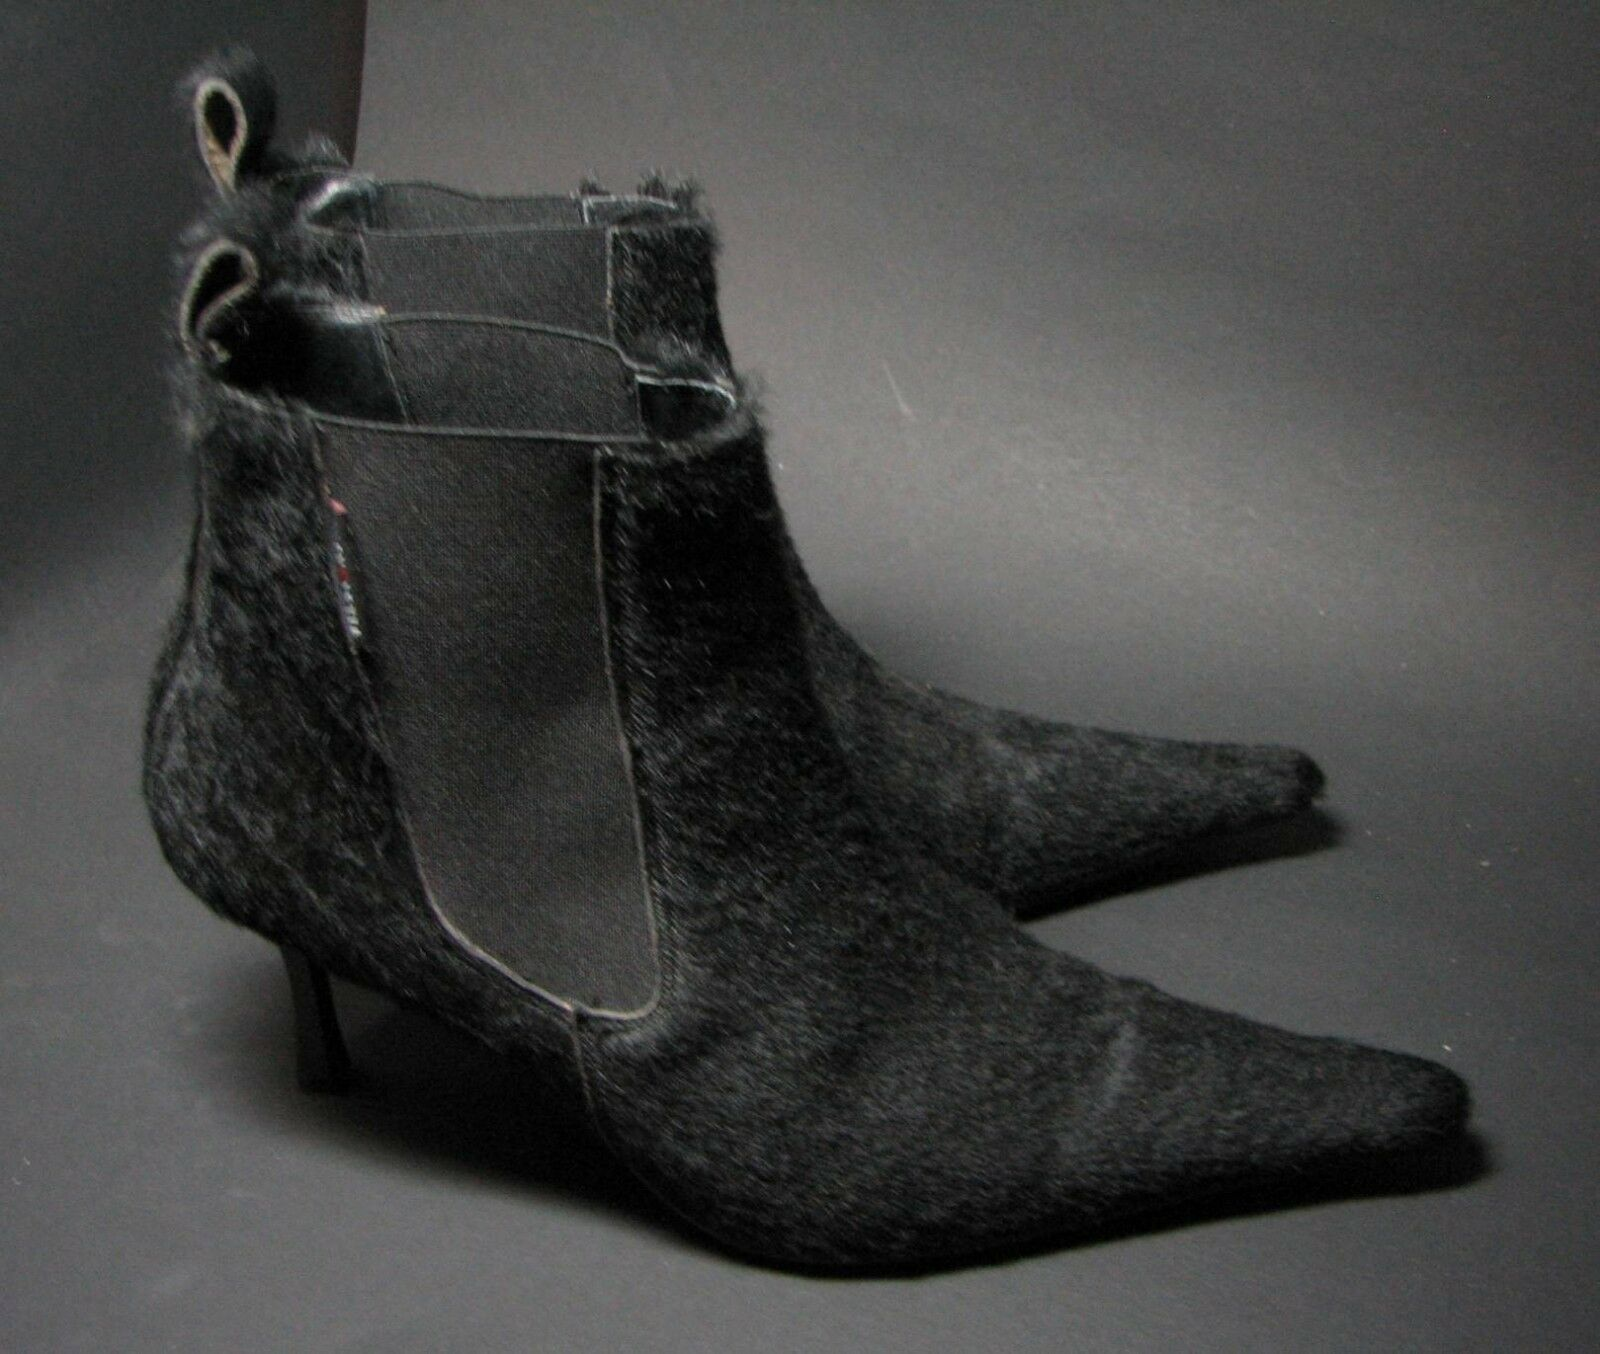 DIAVOLEZZA Stiefellette echt Fell 38 High Heels schwarz Ankle Stiefel fast wie NEU